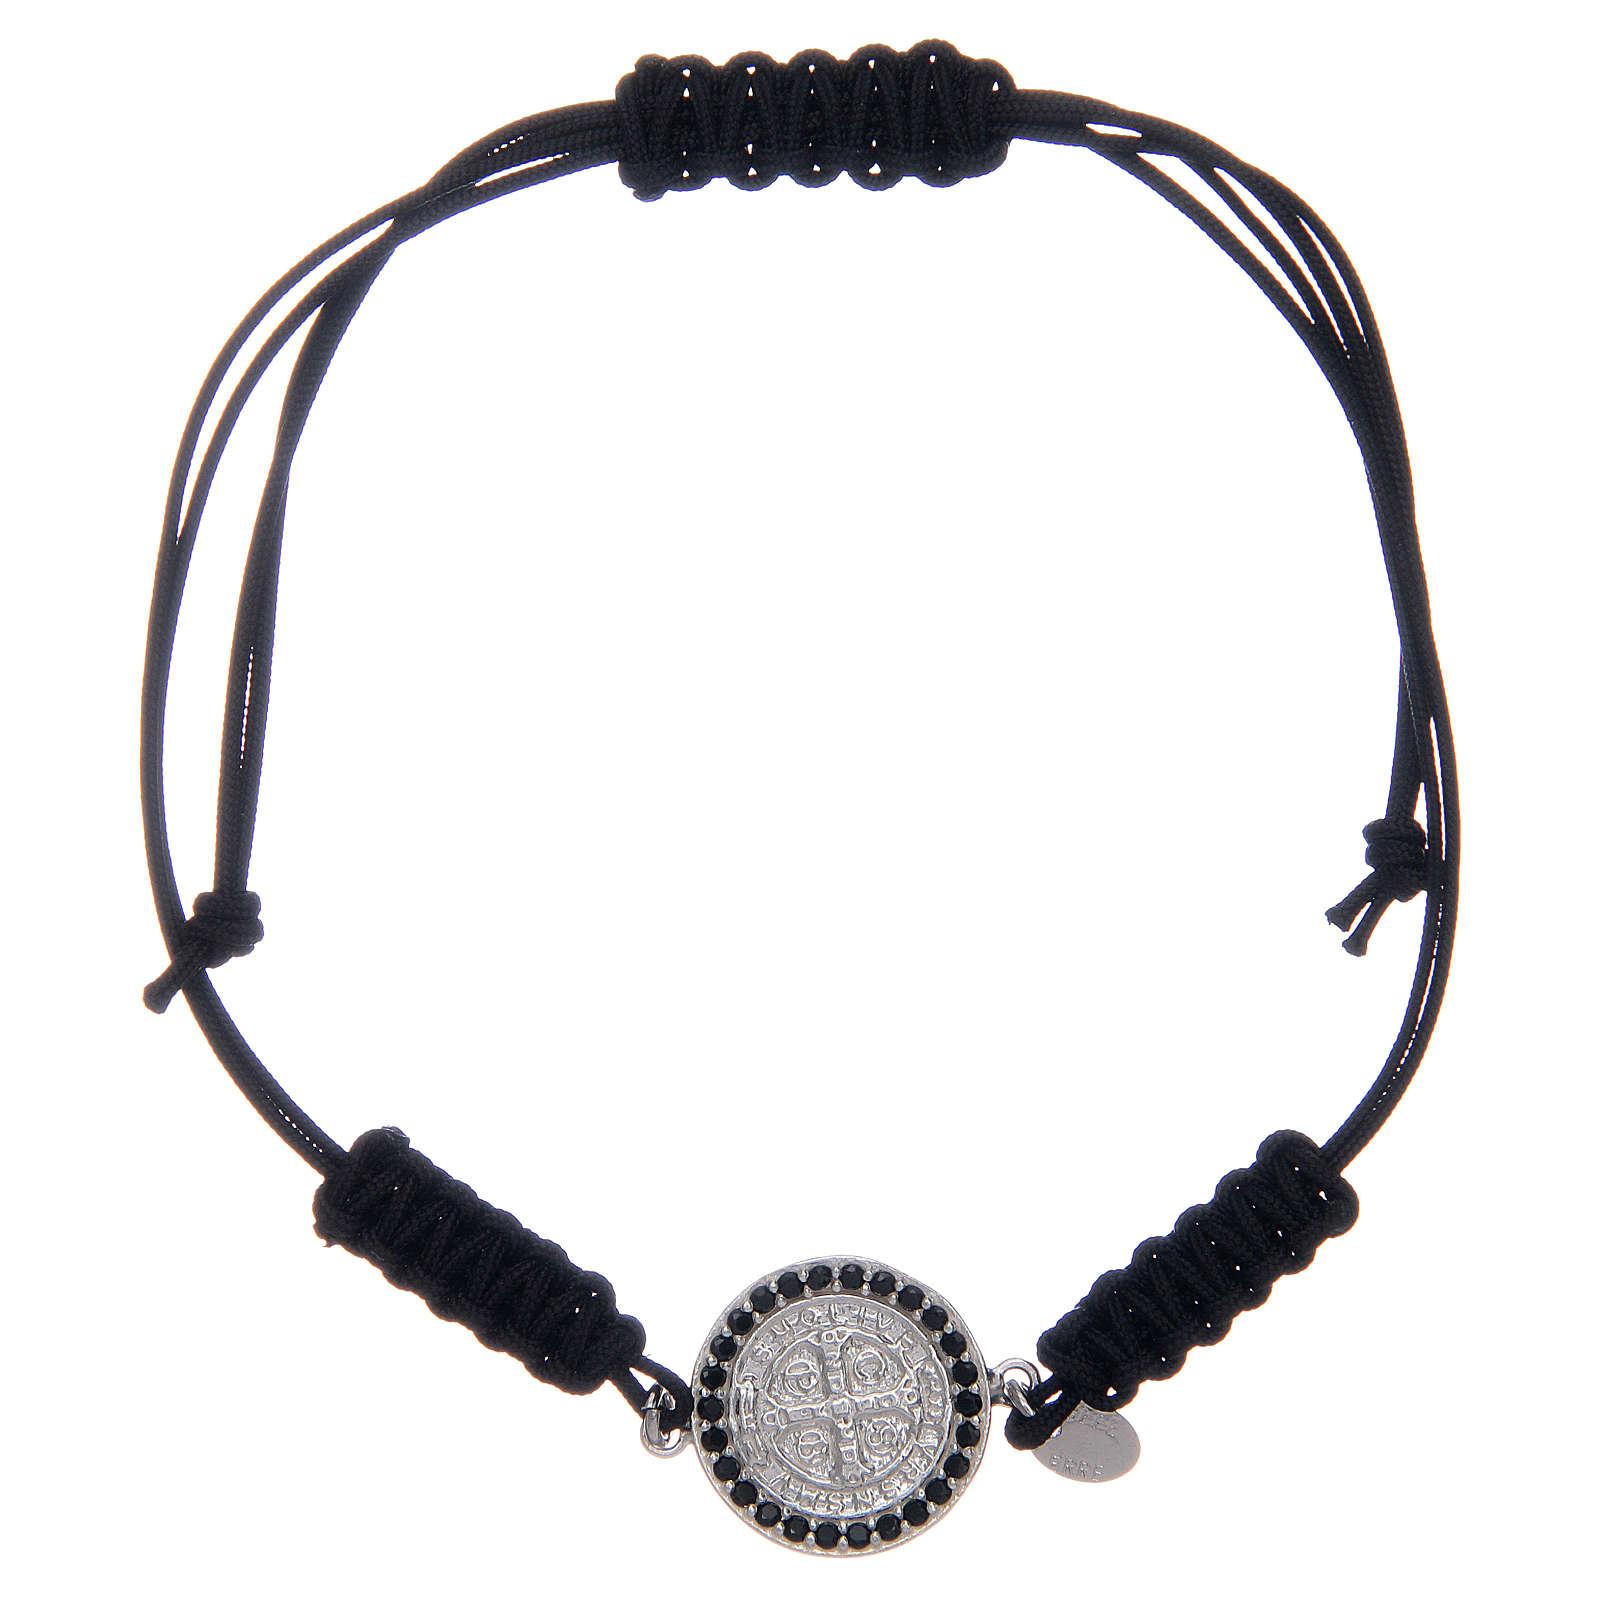 Pulsera cuerda plata 925 S. Benito plateada zircones negros 4